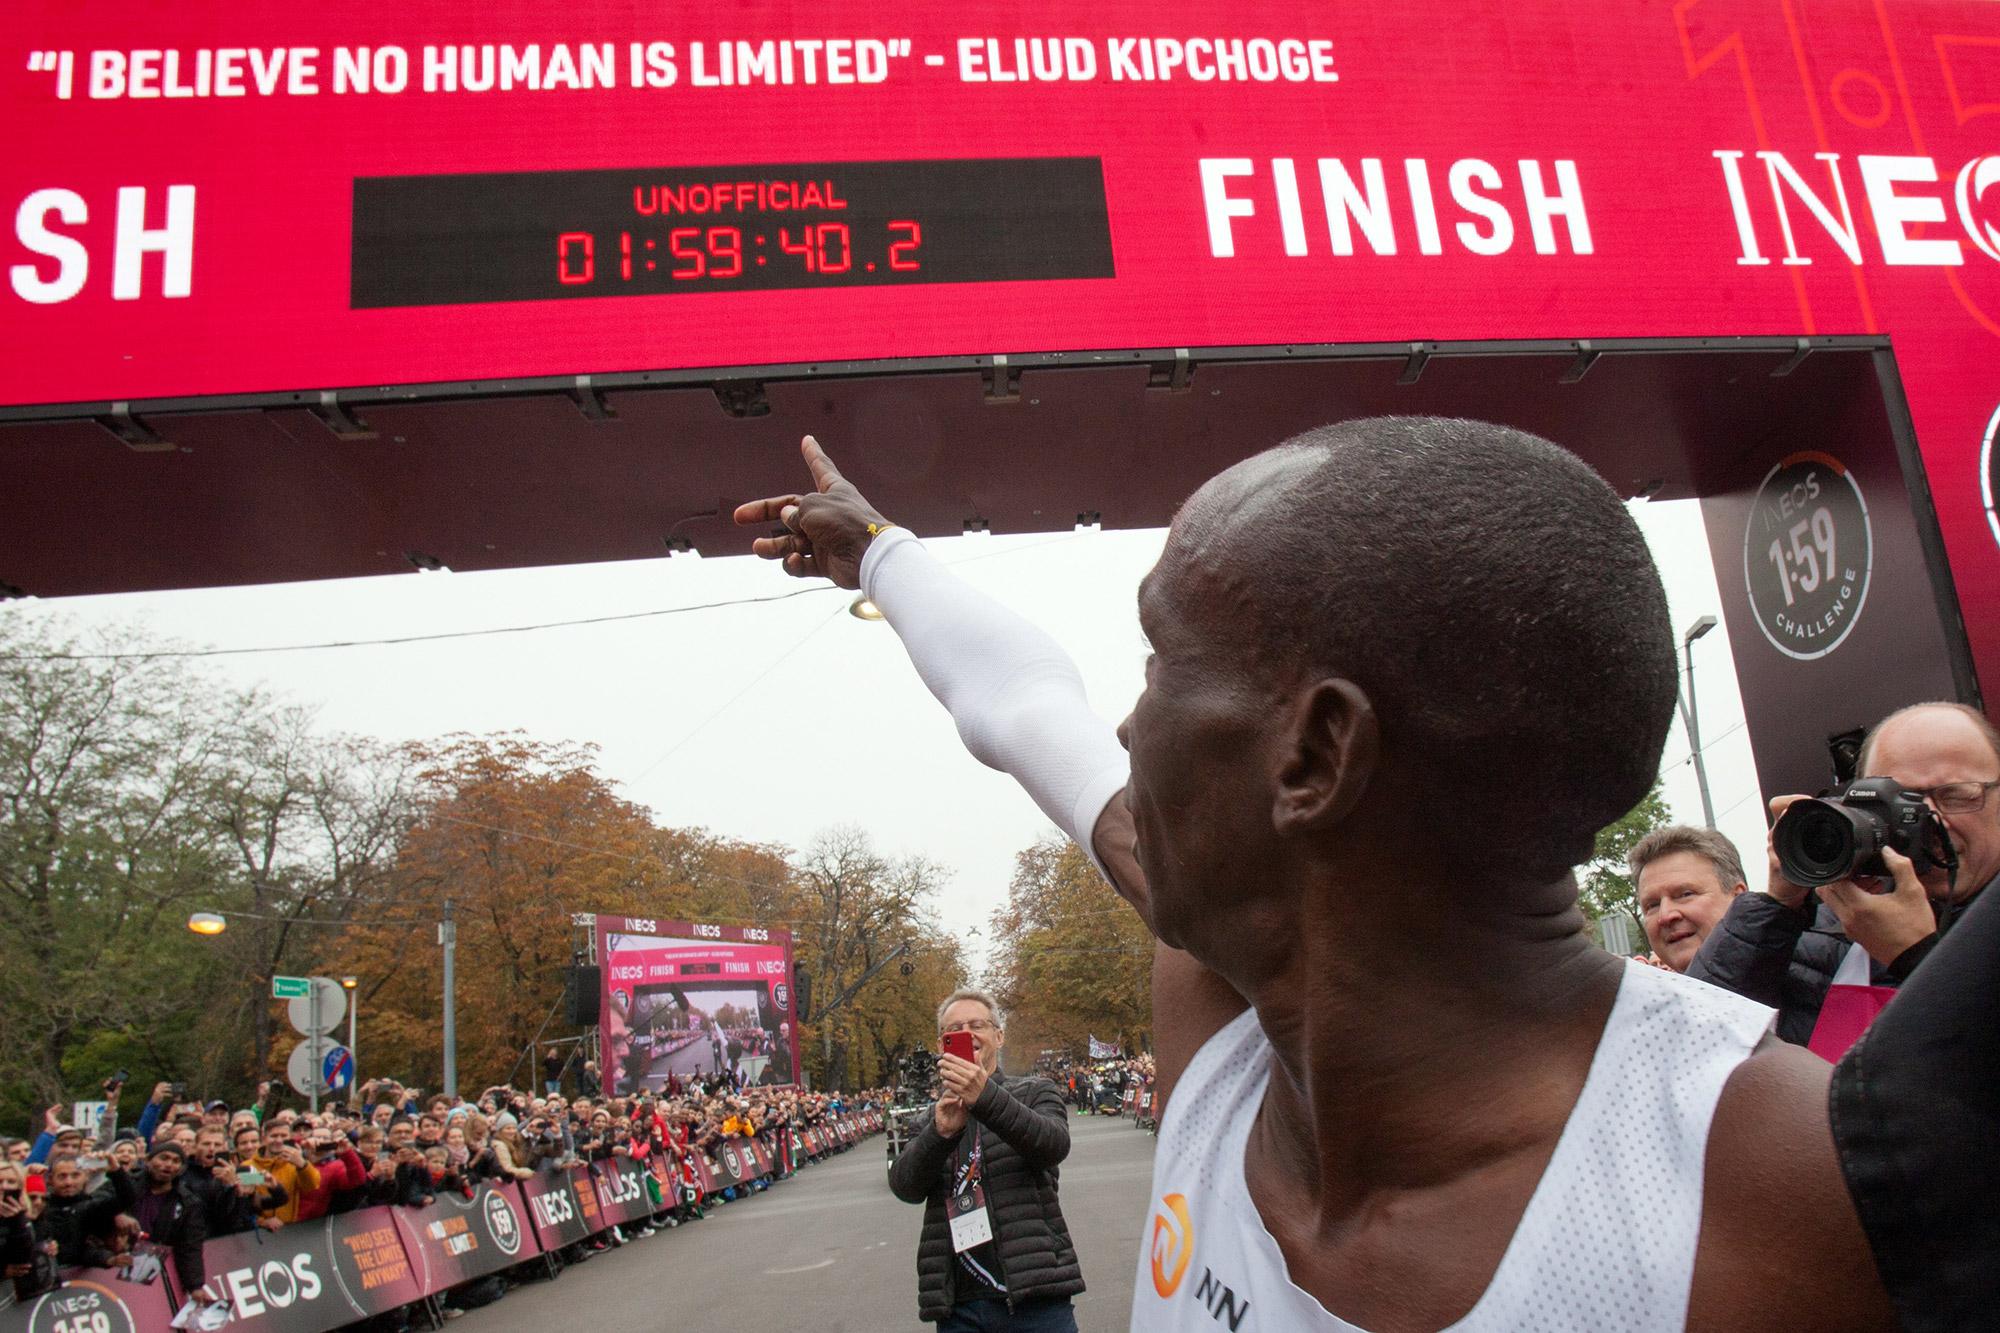 No Human Is Limited': Kipchoge Runs Sub-2 Hour Marathon - Bloomberg